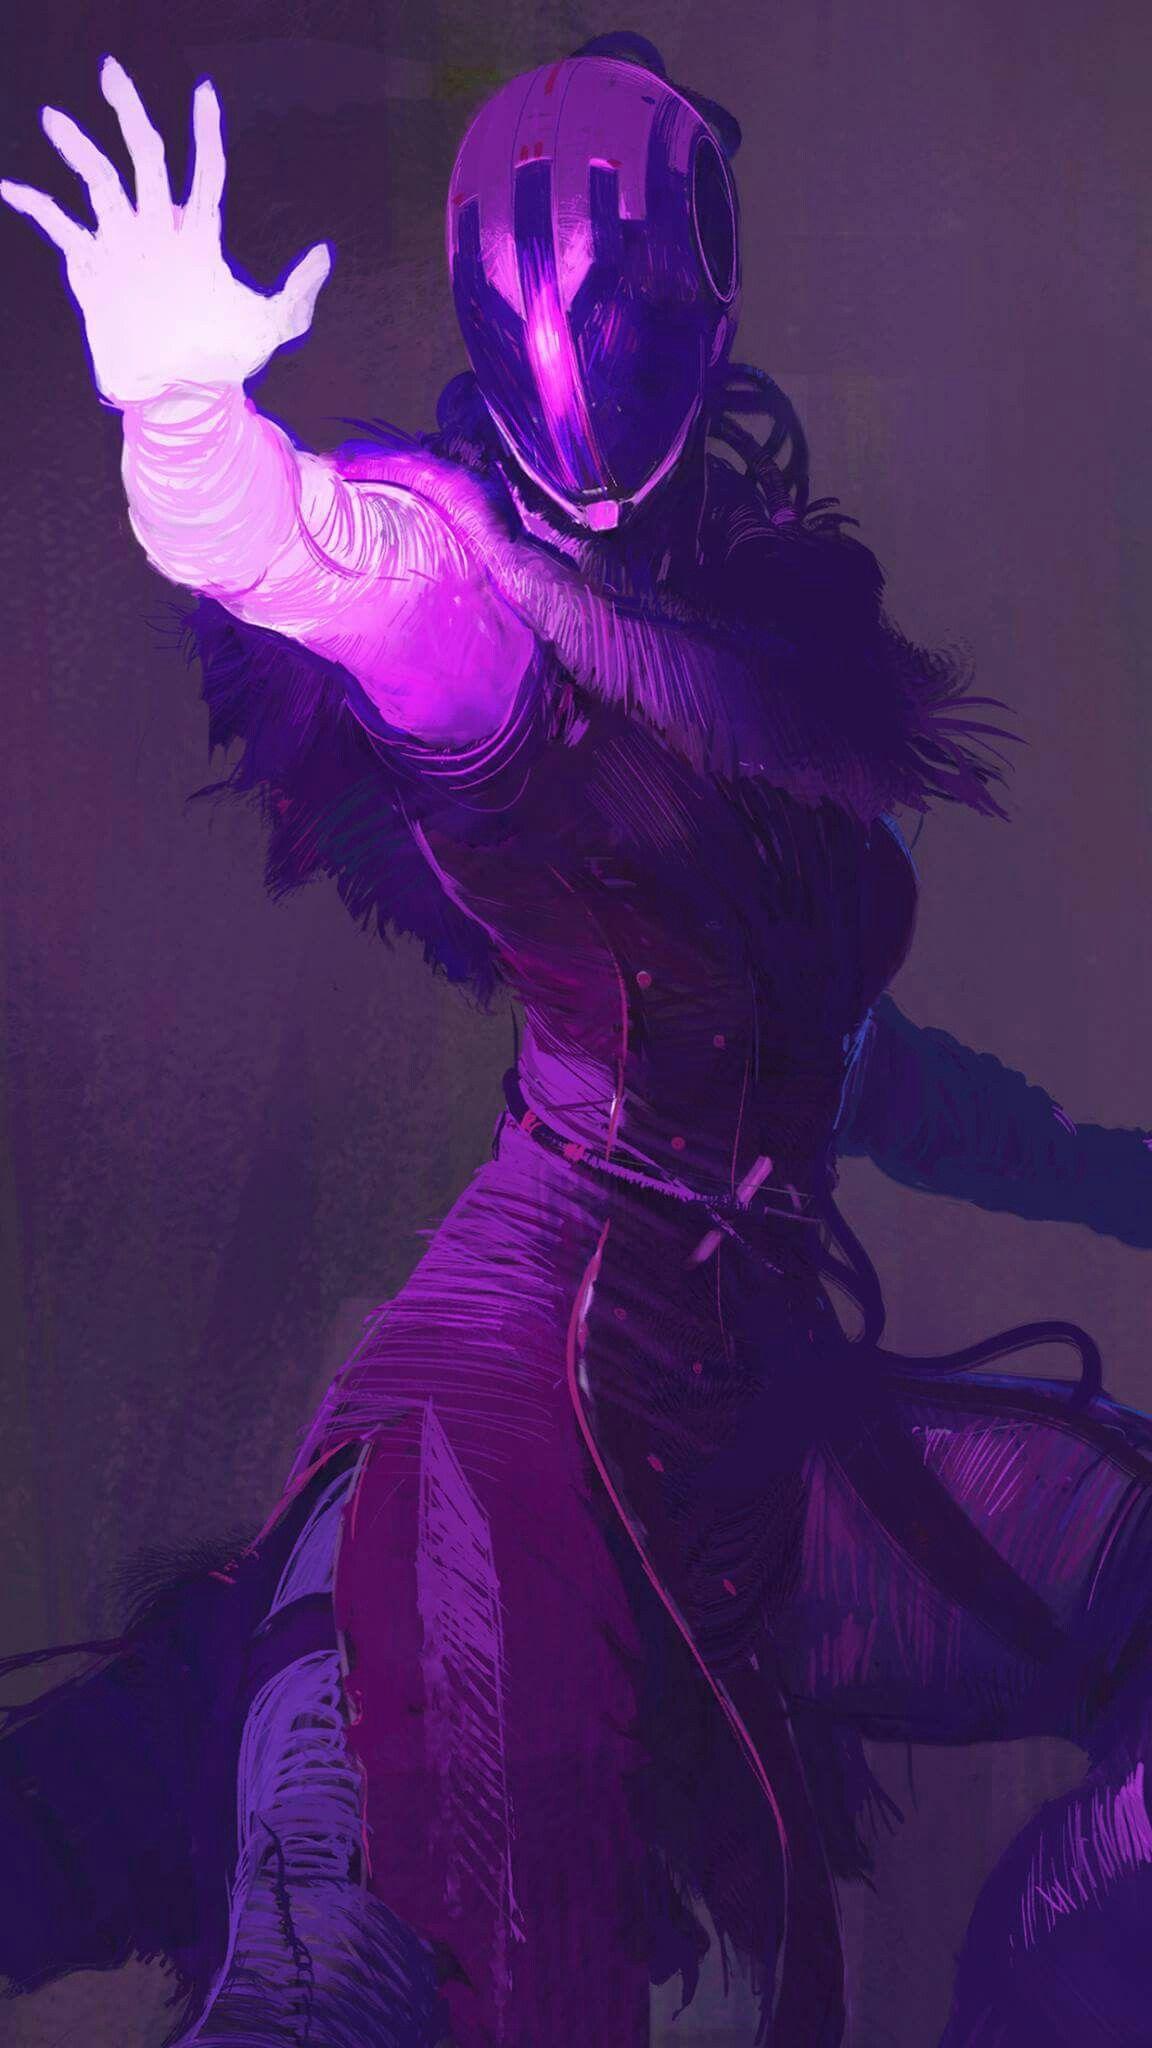 Voidwalker Warlock from Destiny (Art by Activision Press